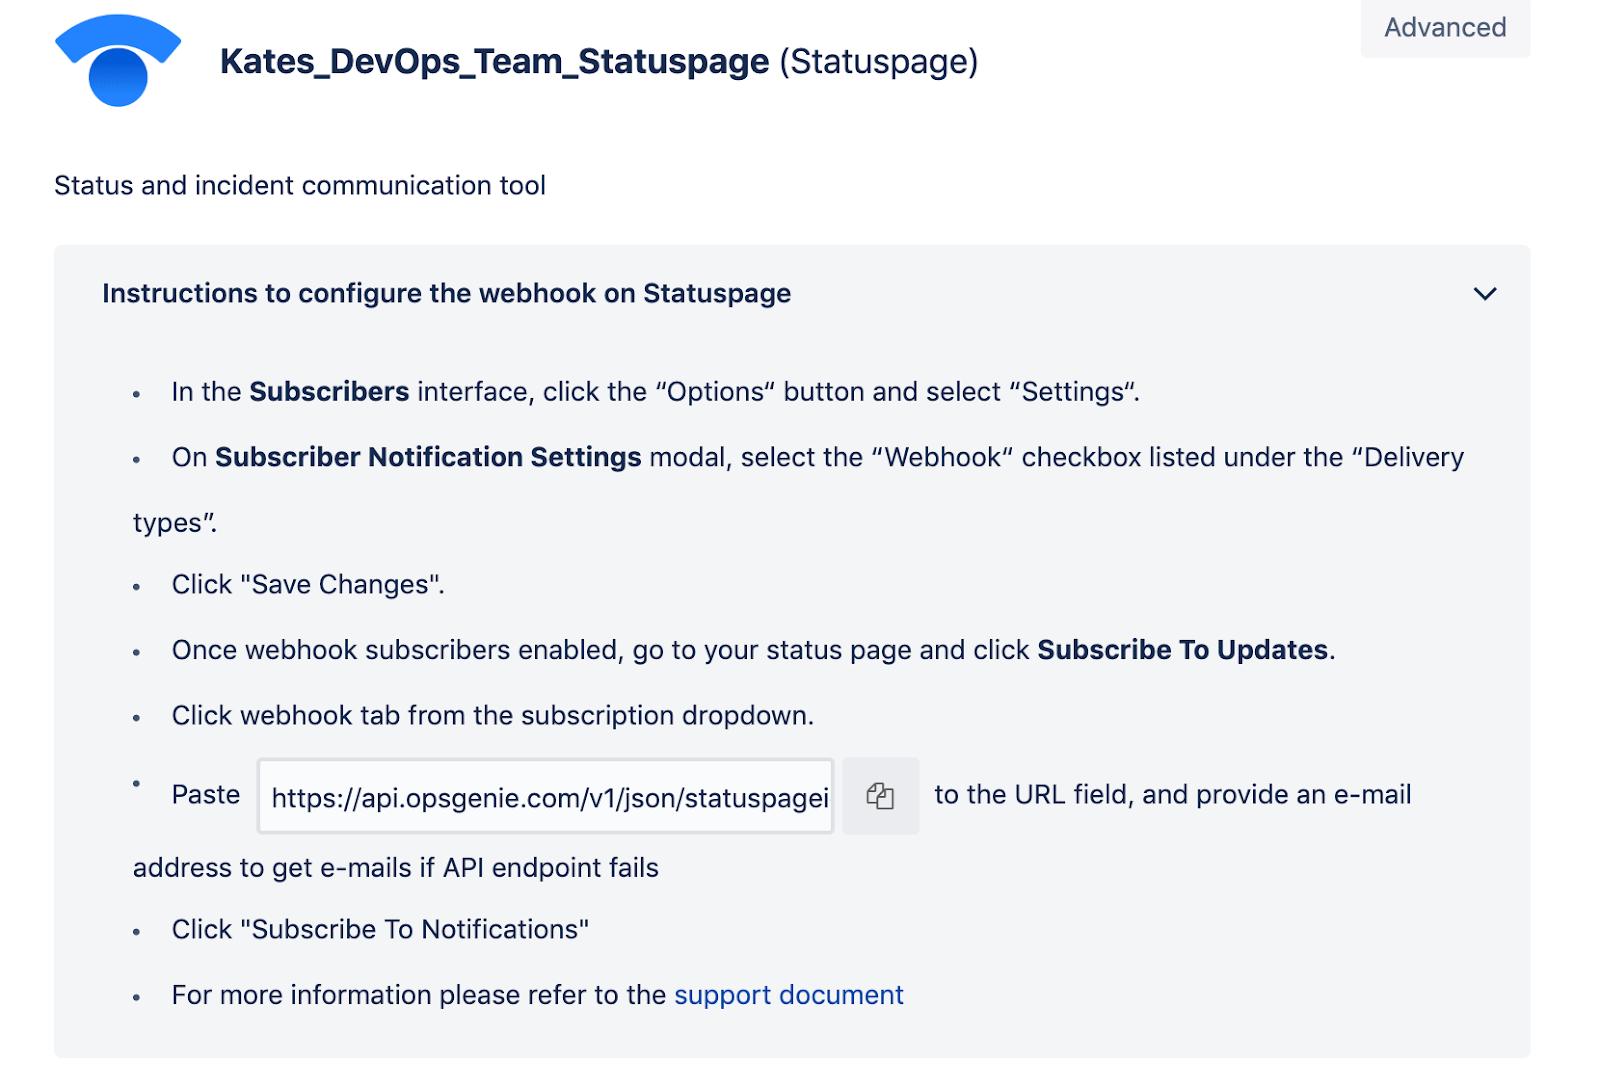 Instructions to configure webhook on Statuspage